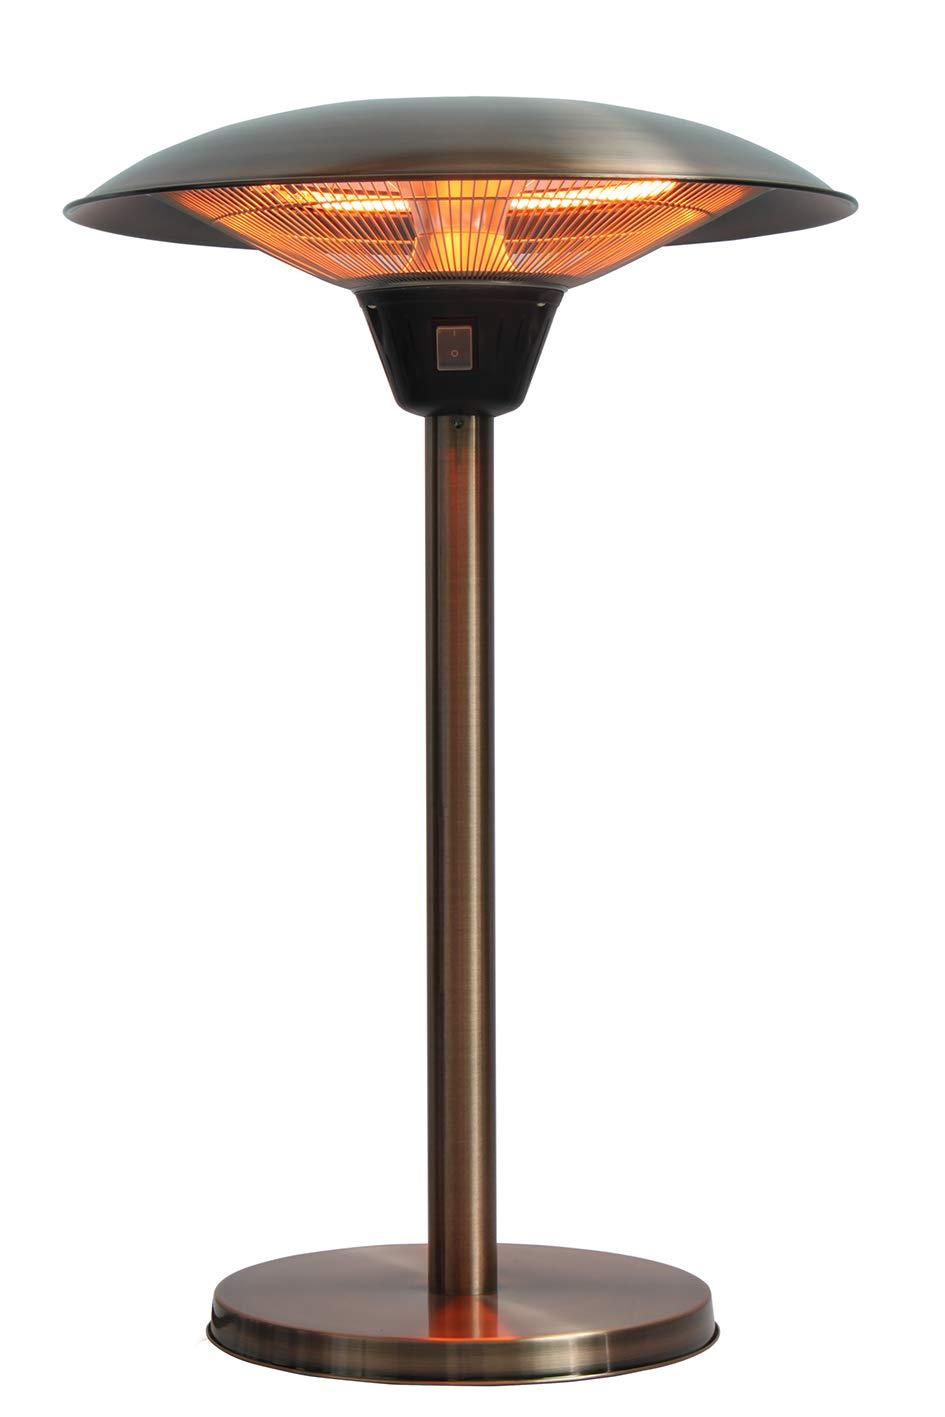 Fire Sense 62217 Cimarron Brushed Coppertone Patio Heater by Fire Sense